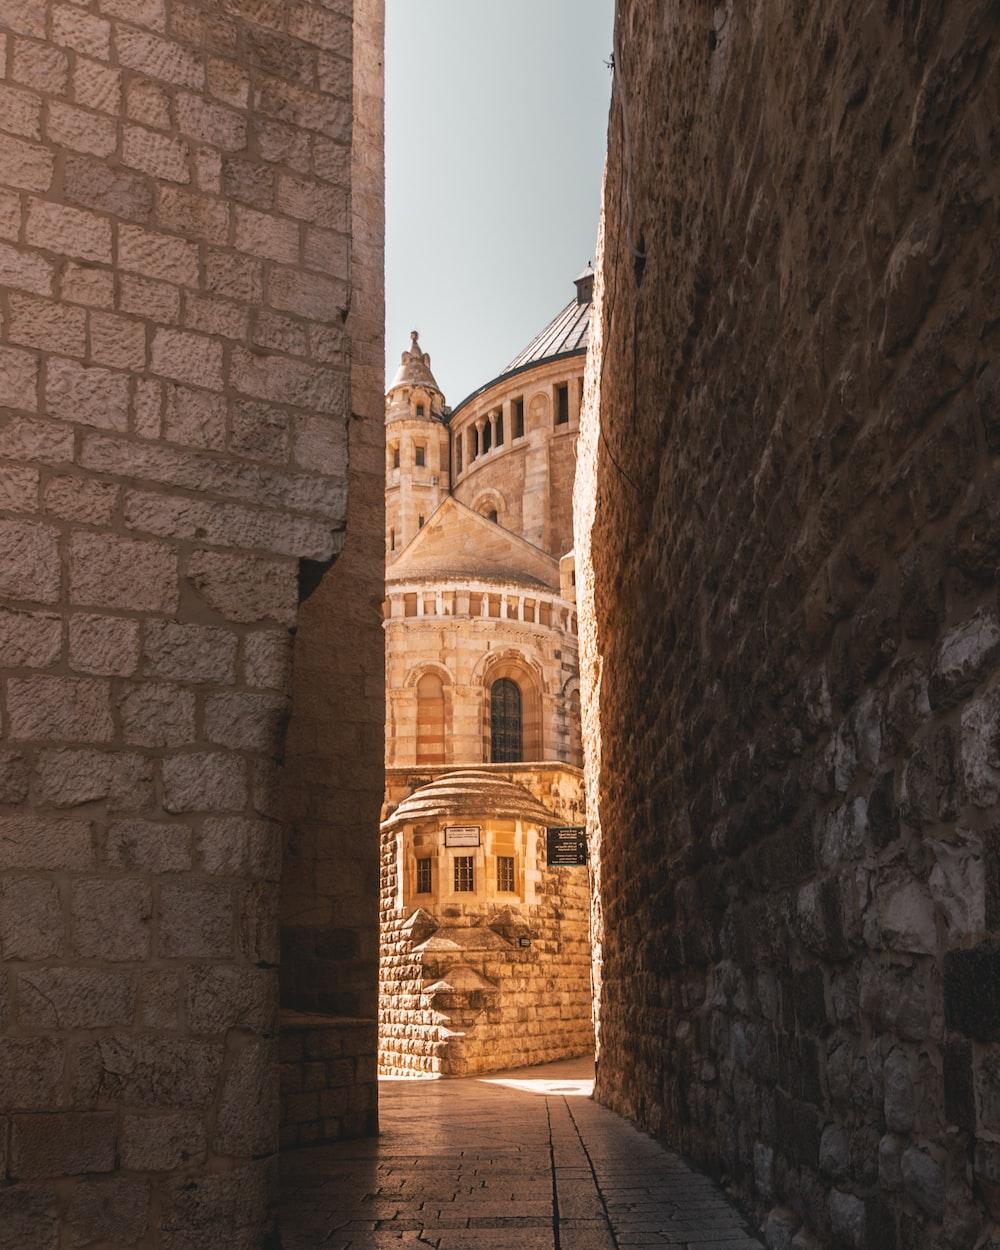 pathway in between of bricked buildings through castle